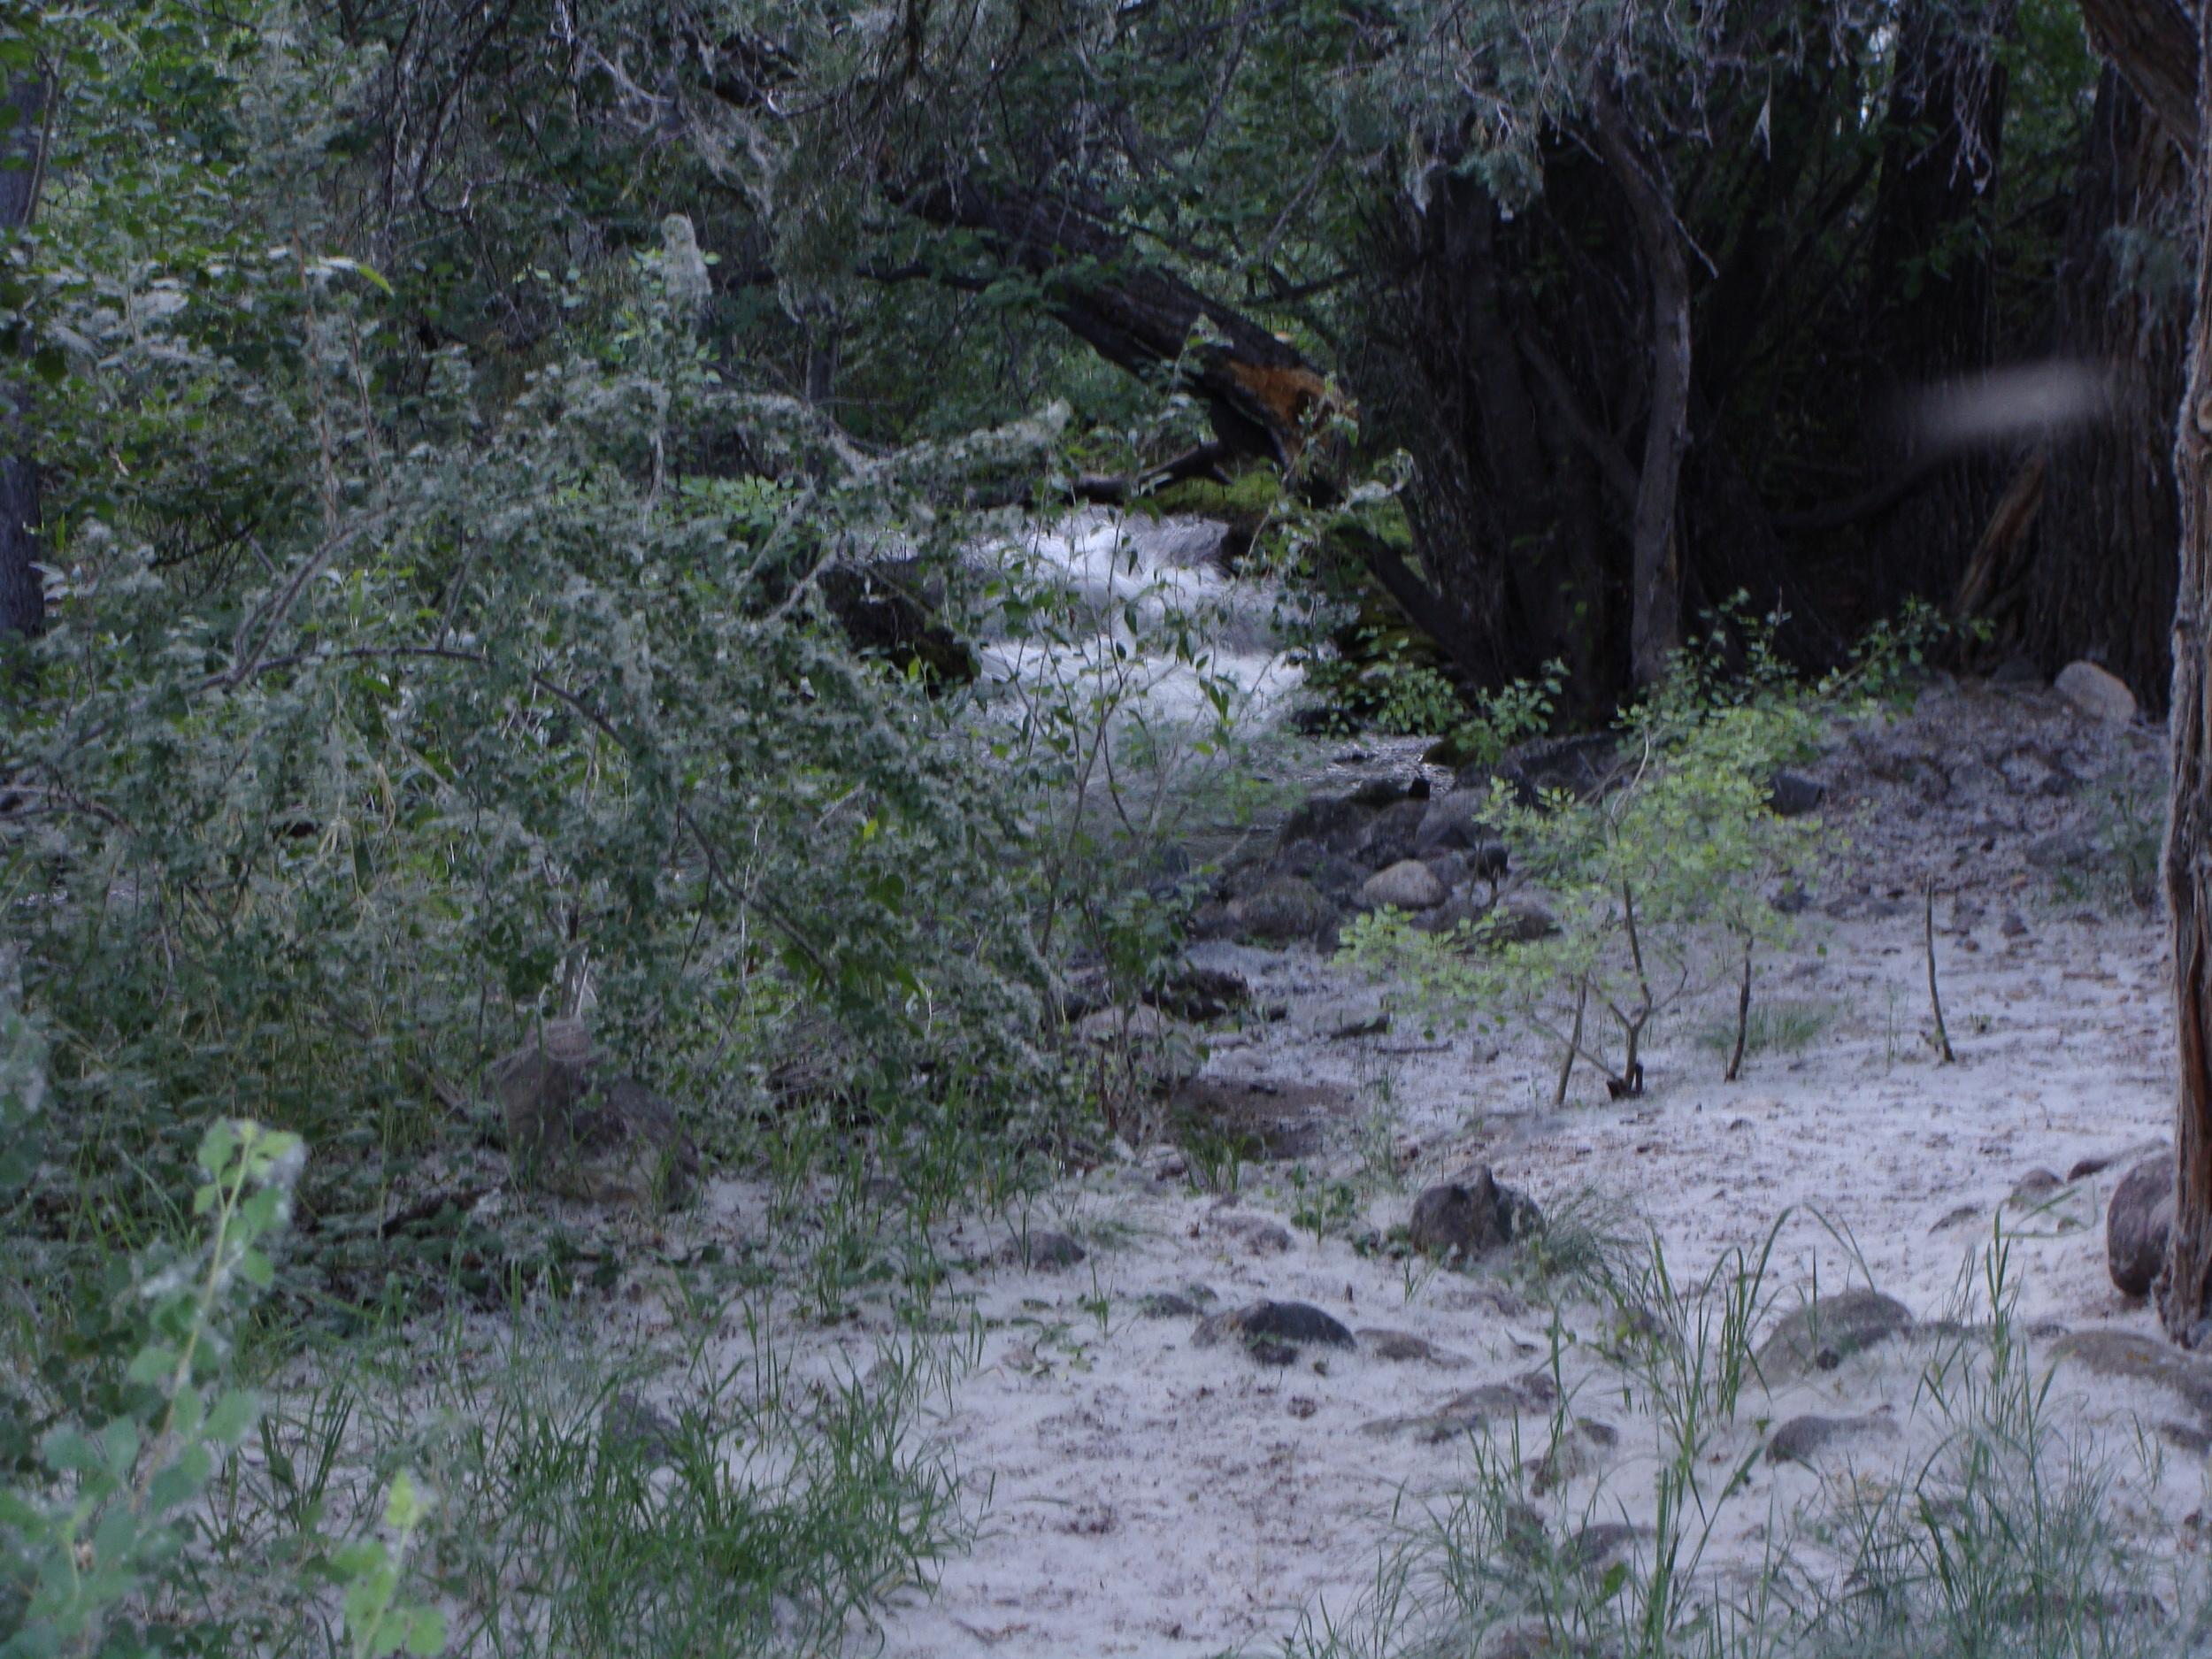 Cottonwood 'snow' on Cottonwood Creek. Ah, summer in the Sangres!